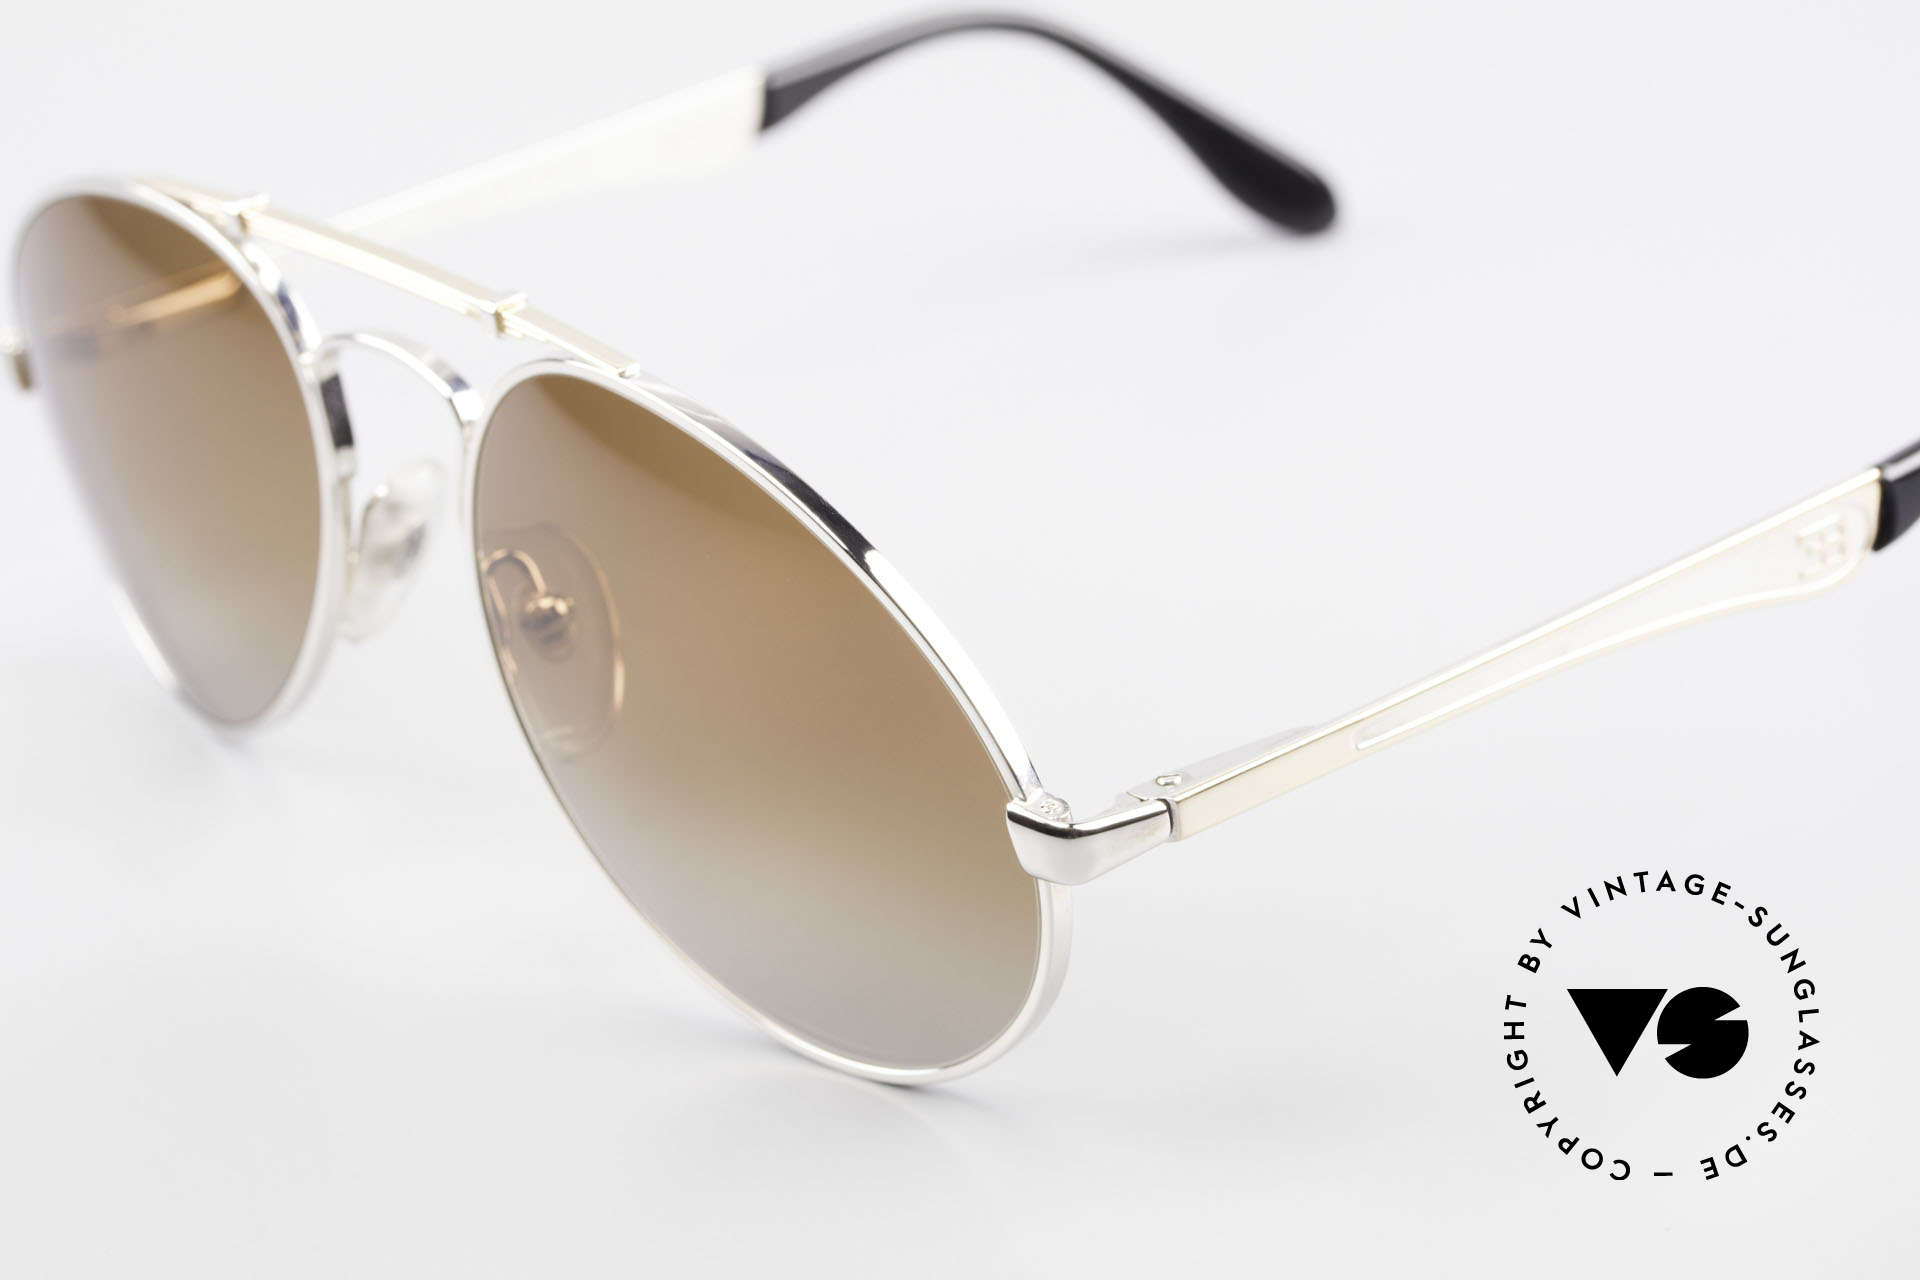 Bugatti 11909 80's Luxury Sunglasses Men, bridge is shaped like a leaf spring (silver/gold), Made for Men